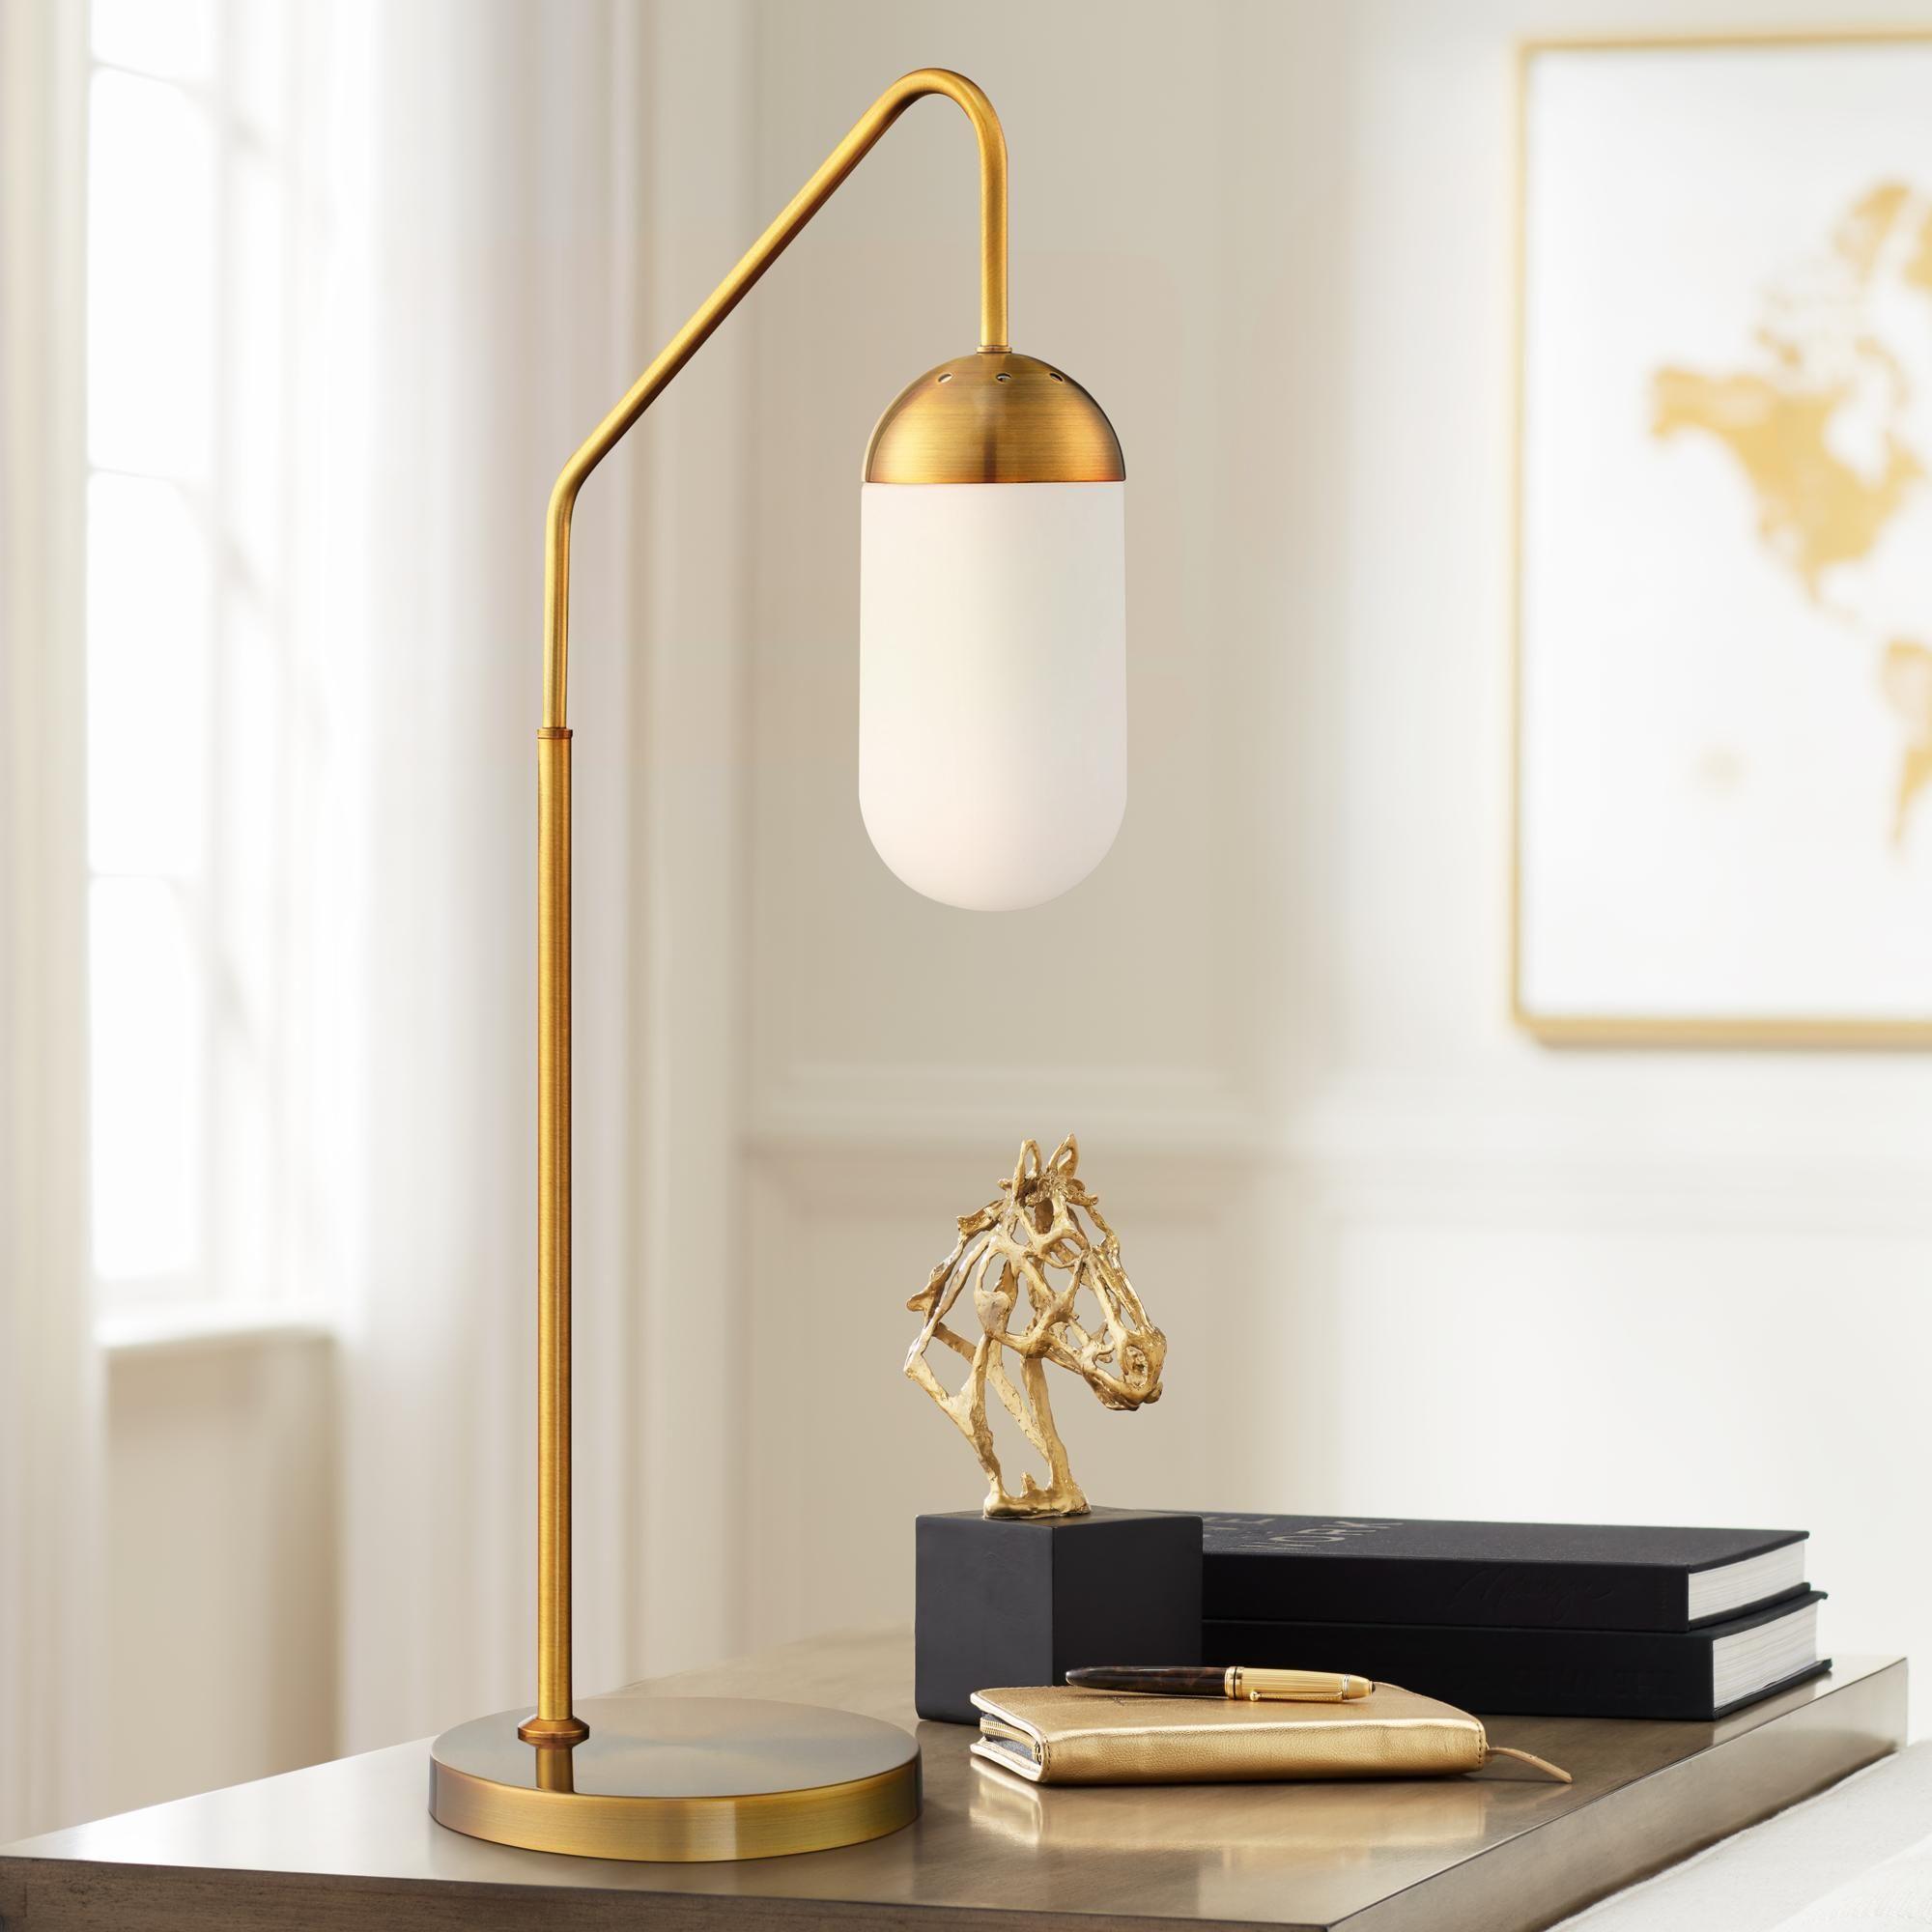 Desk Lamps Lite Source Firefly Antique Brass Downbridge Desk Lamp In 2020 Desk Lamp Desk Lamp Design Retro Desk Lamp